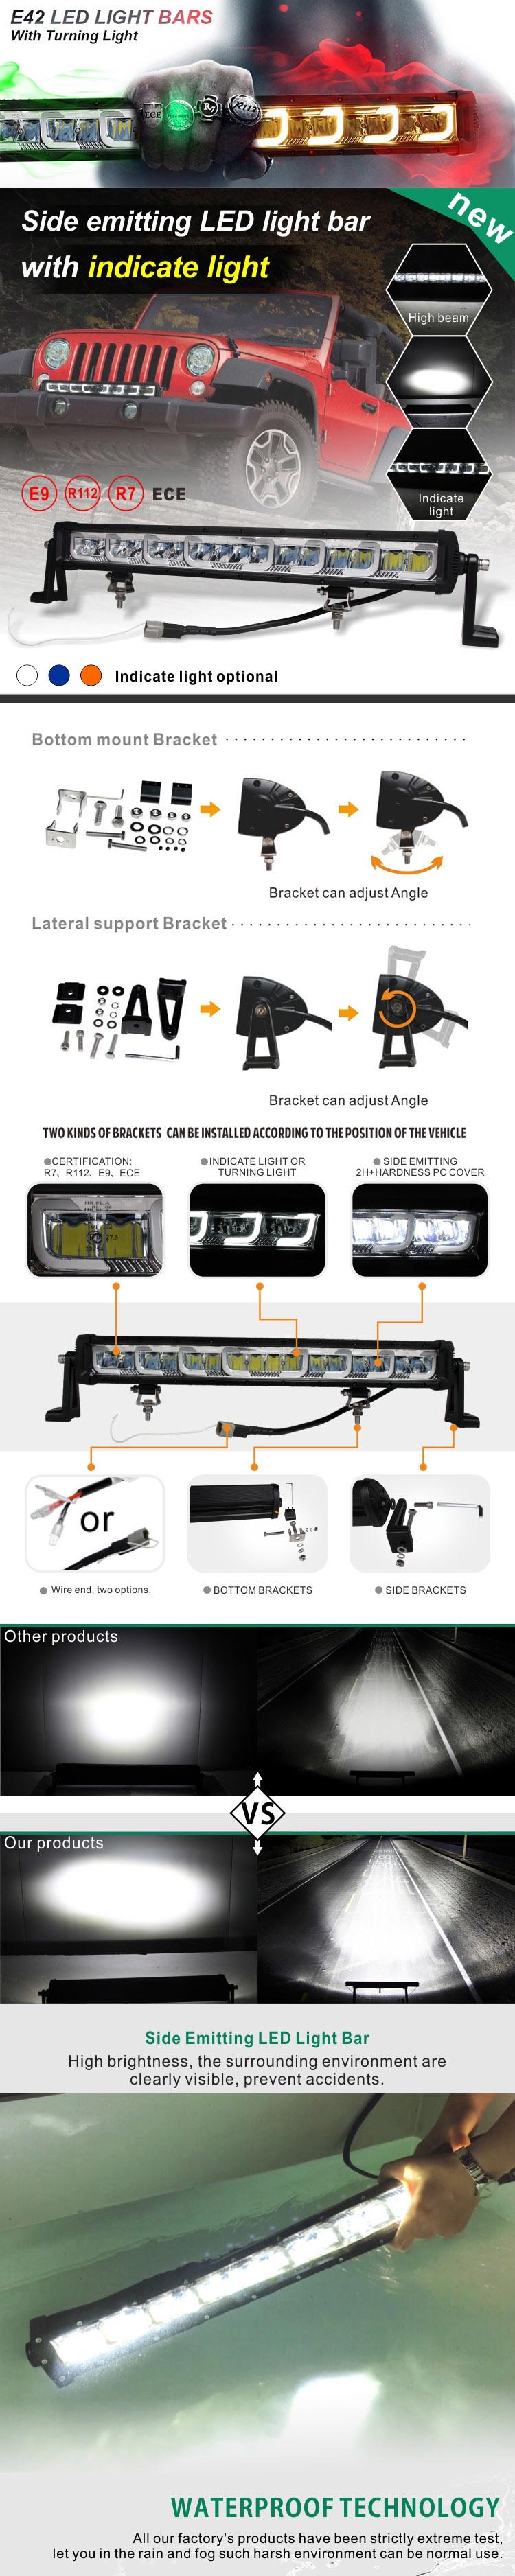 22inch Emark 4X4 off Road IP68 128W Single Row LED Light Bar